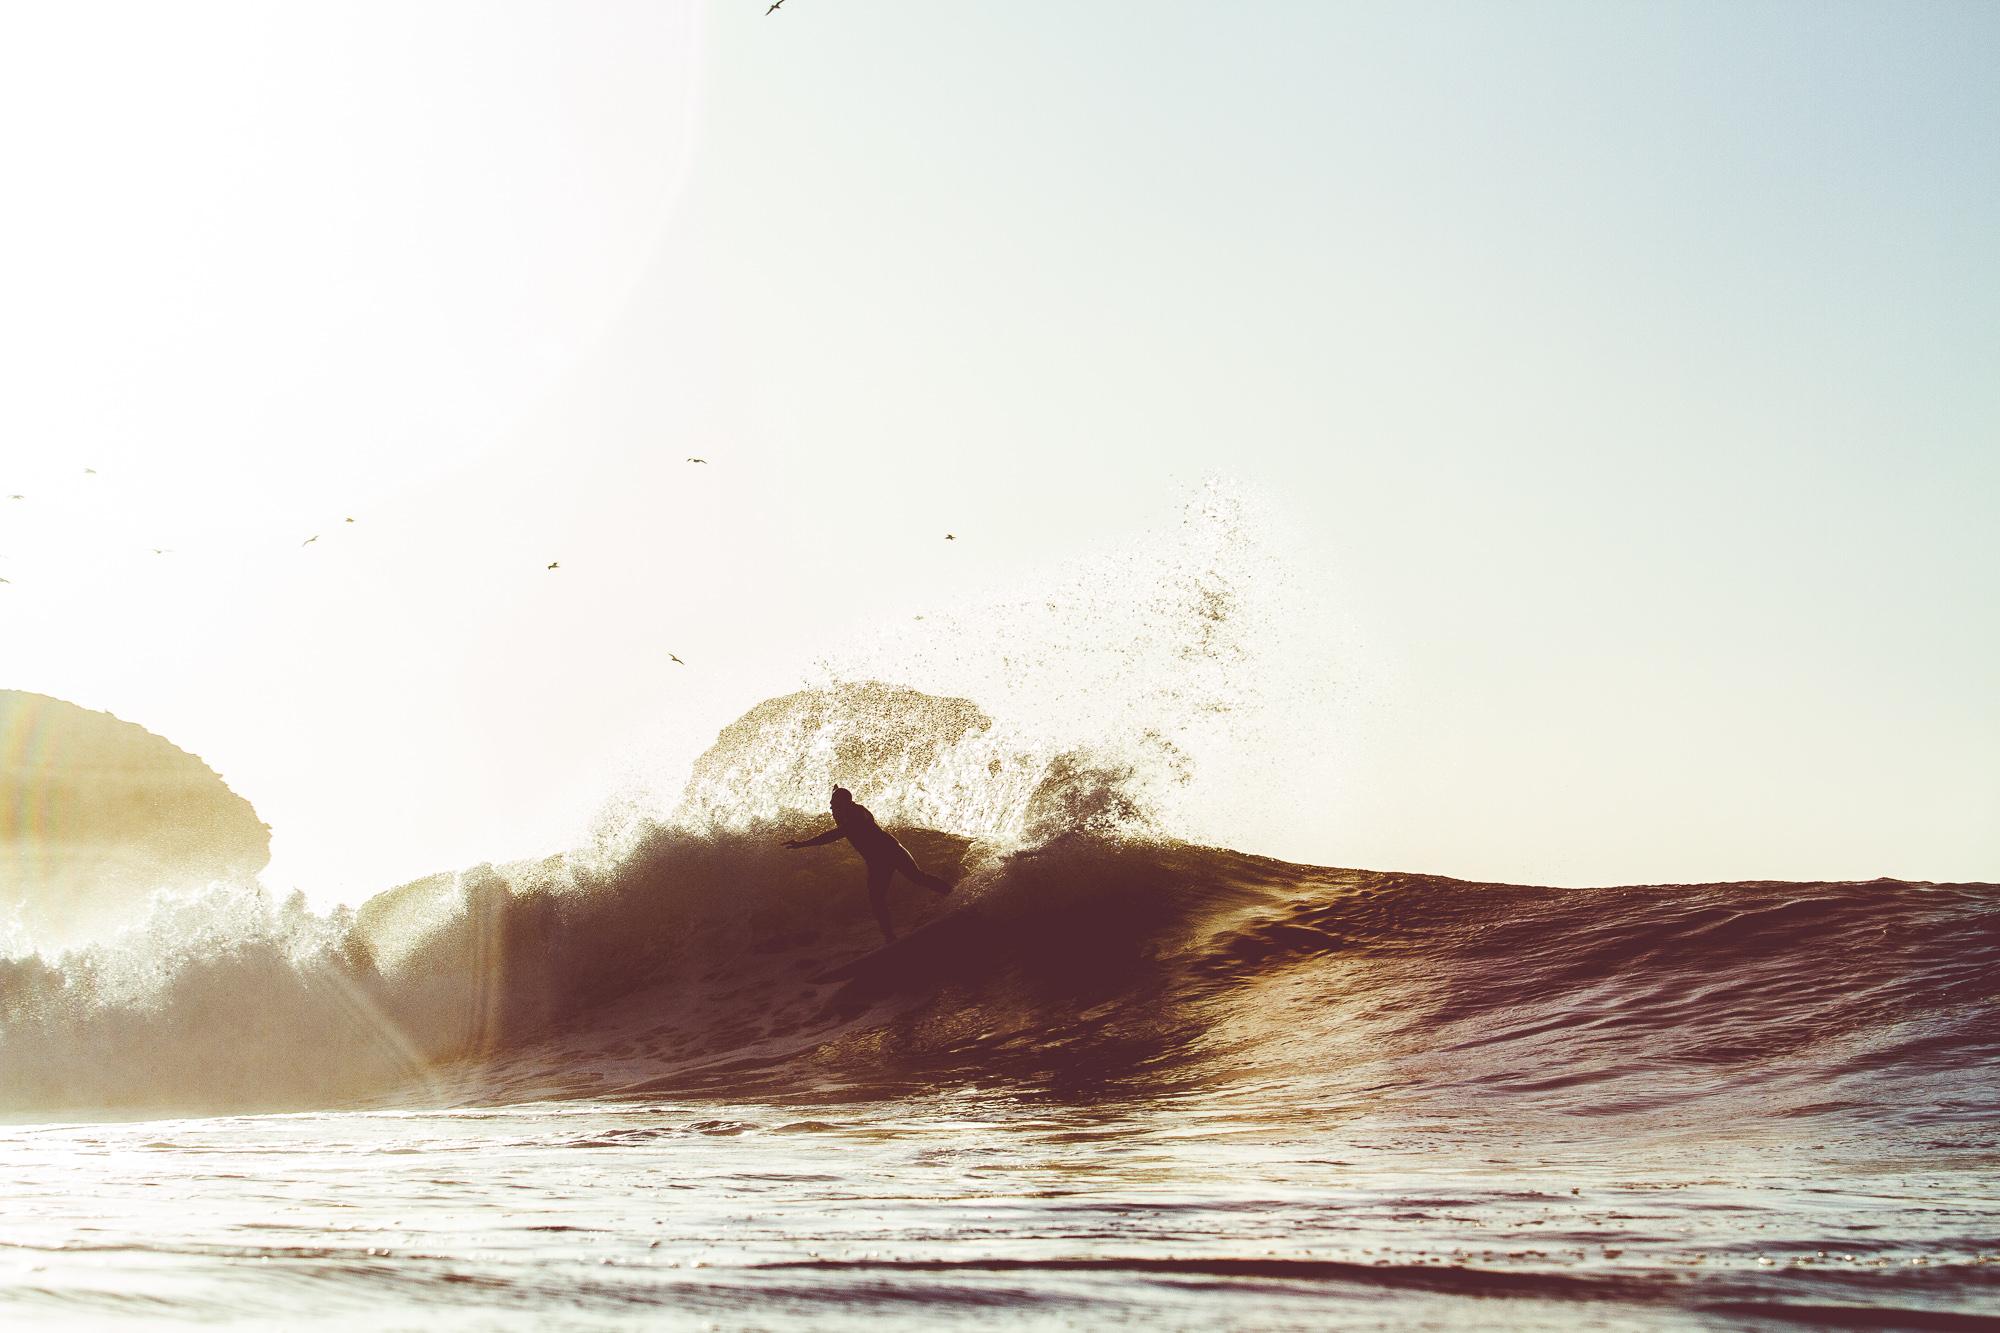 Foto 3 - Jean da Silva - Punta Lobos - Chile - Foto William Zimmermann-38-2.jpg